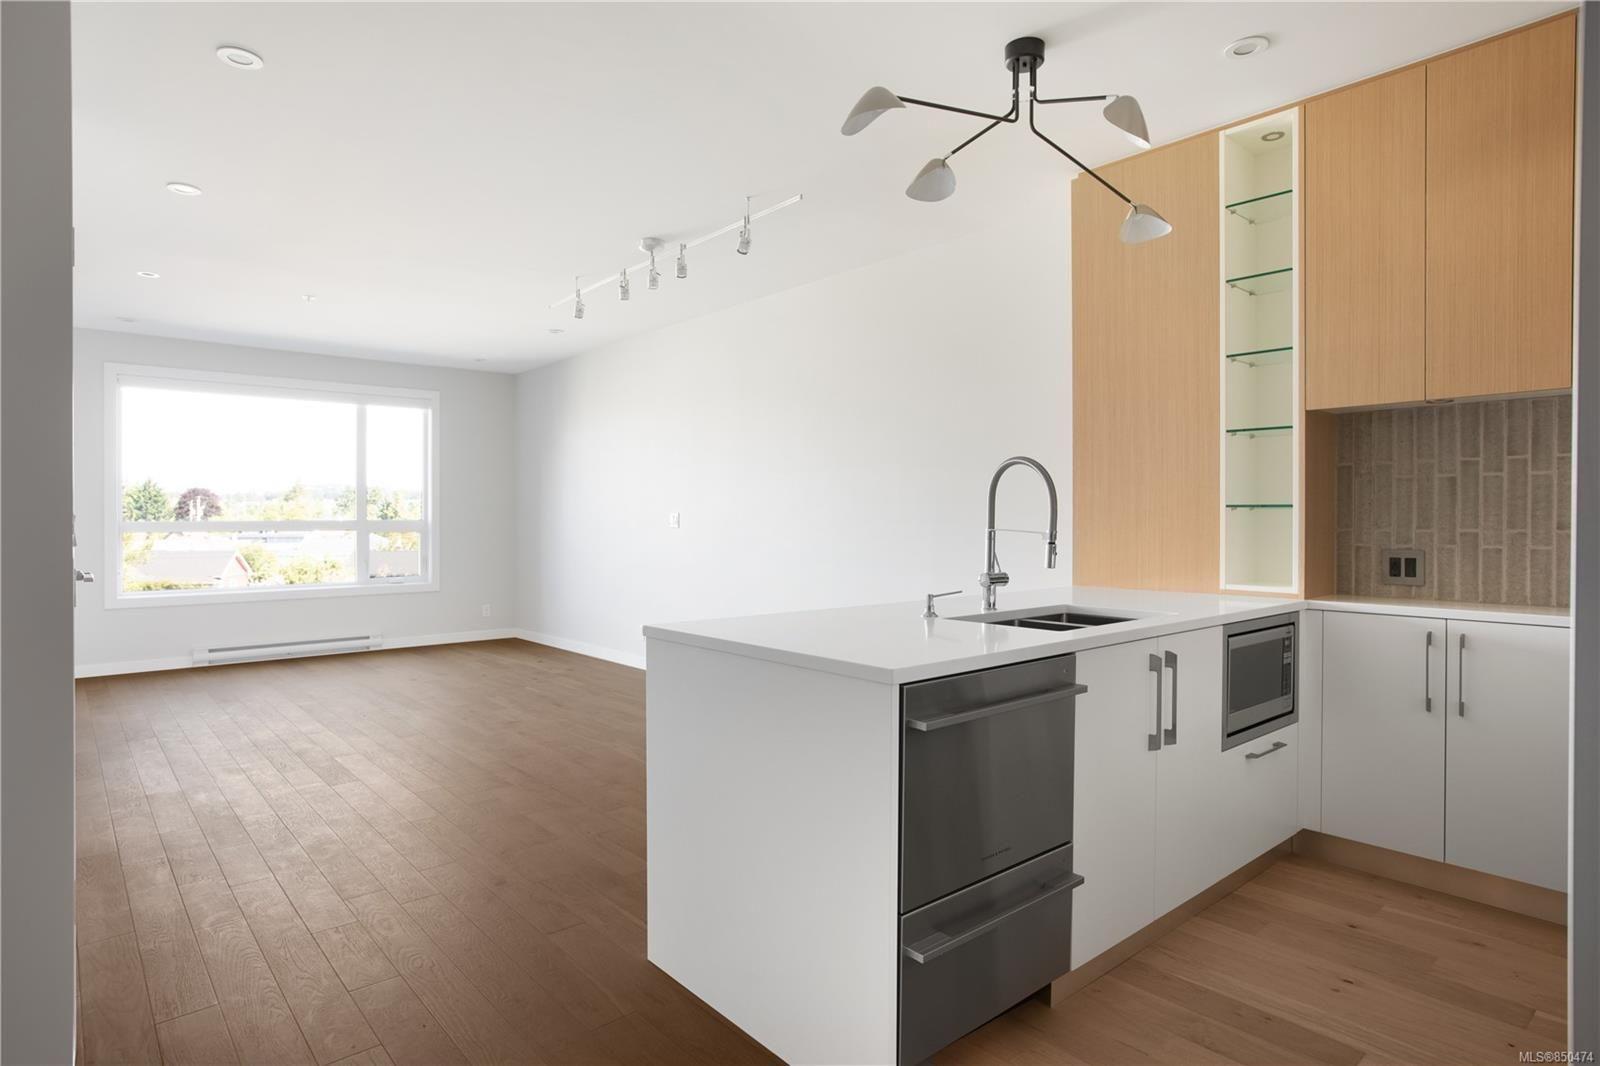 Photo 2: Photos: 309 2285 Bowker Ave in : OB North Oak Bay Condo for sale (Oak Bay)  : MLS®# 850474